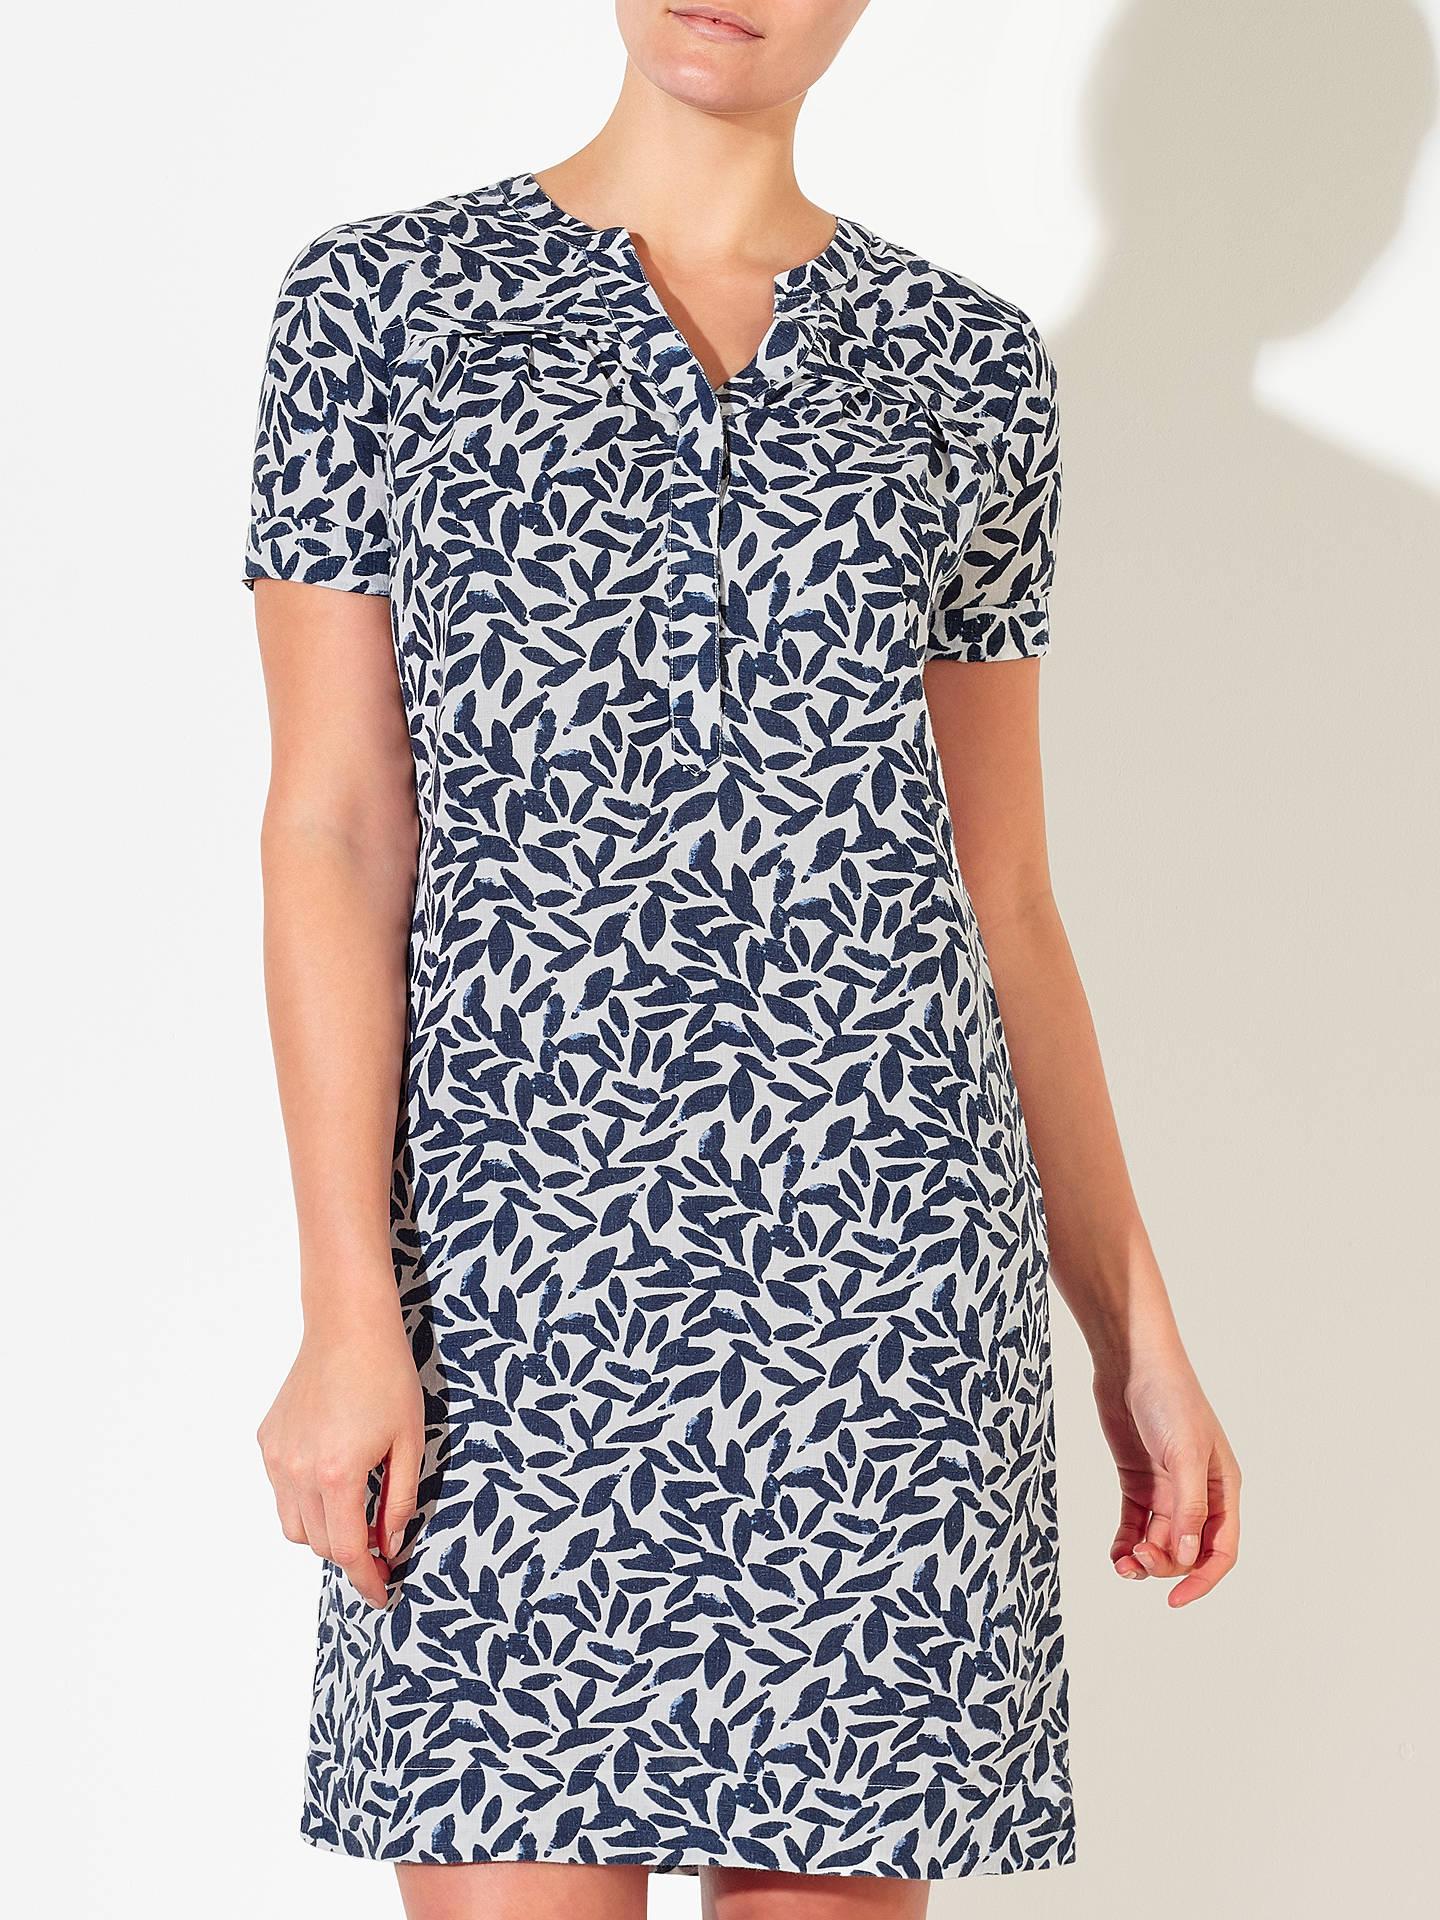 3b6ba0ba02 ... BuyJohn Lewis Linen Notch Leaf Print Dress